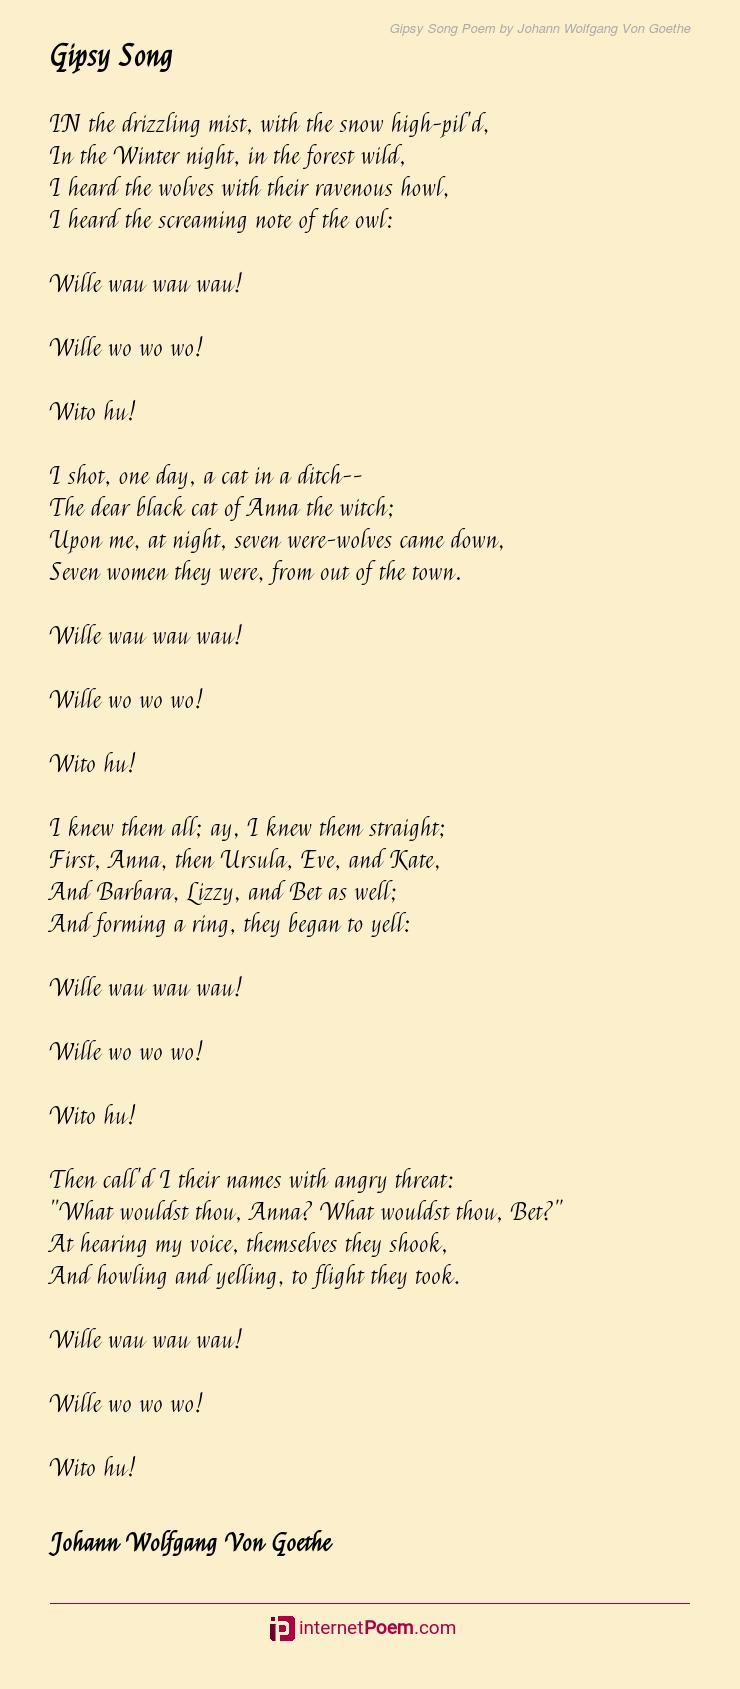 Gipsy Song Poem By Johann Wolfgang Von Goethe